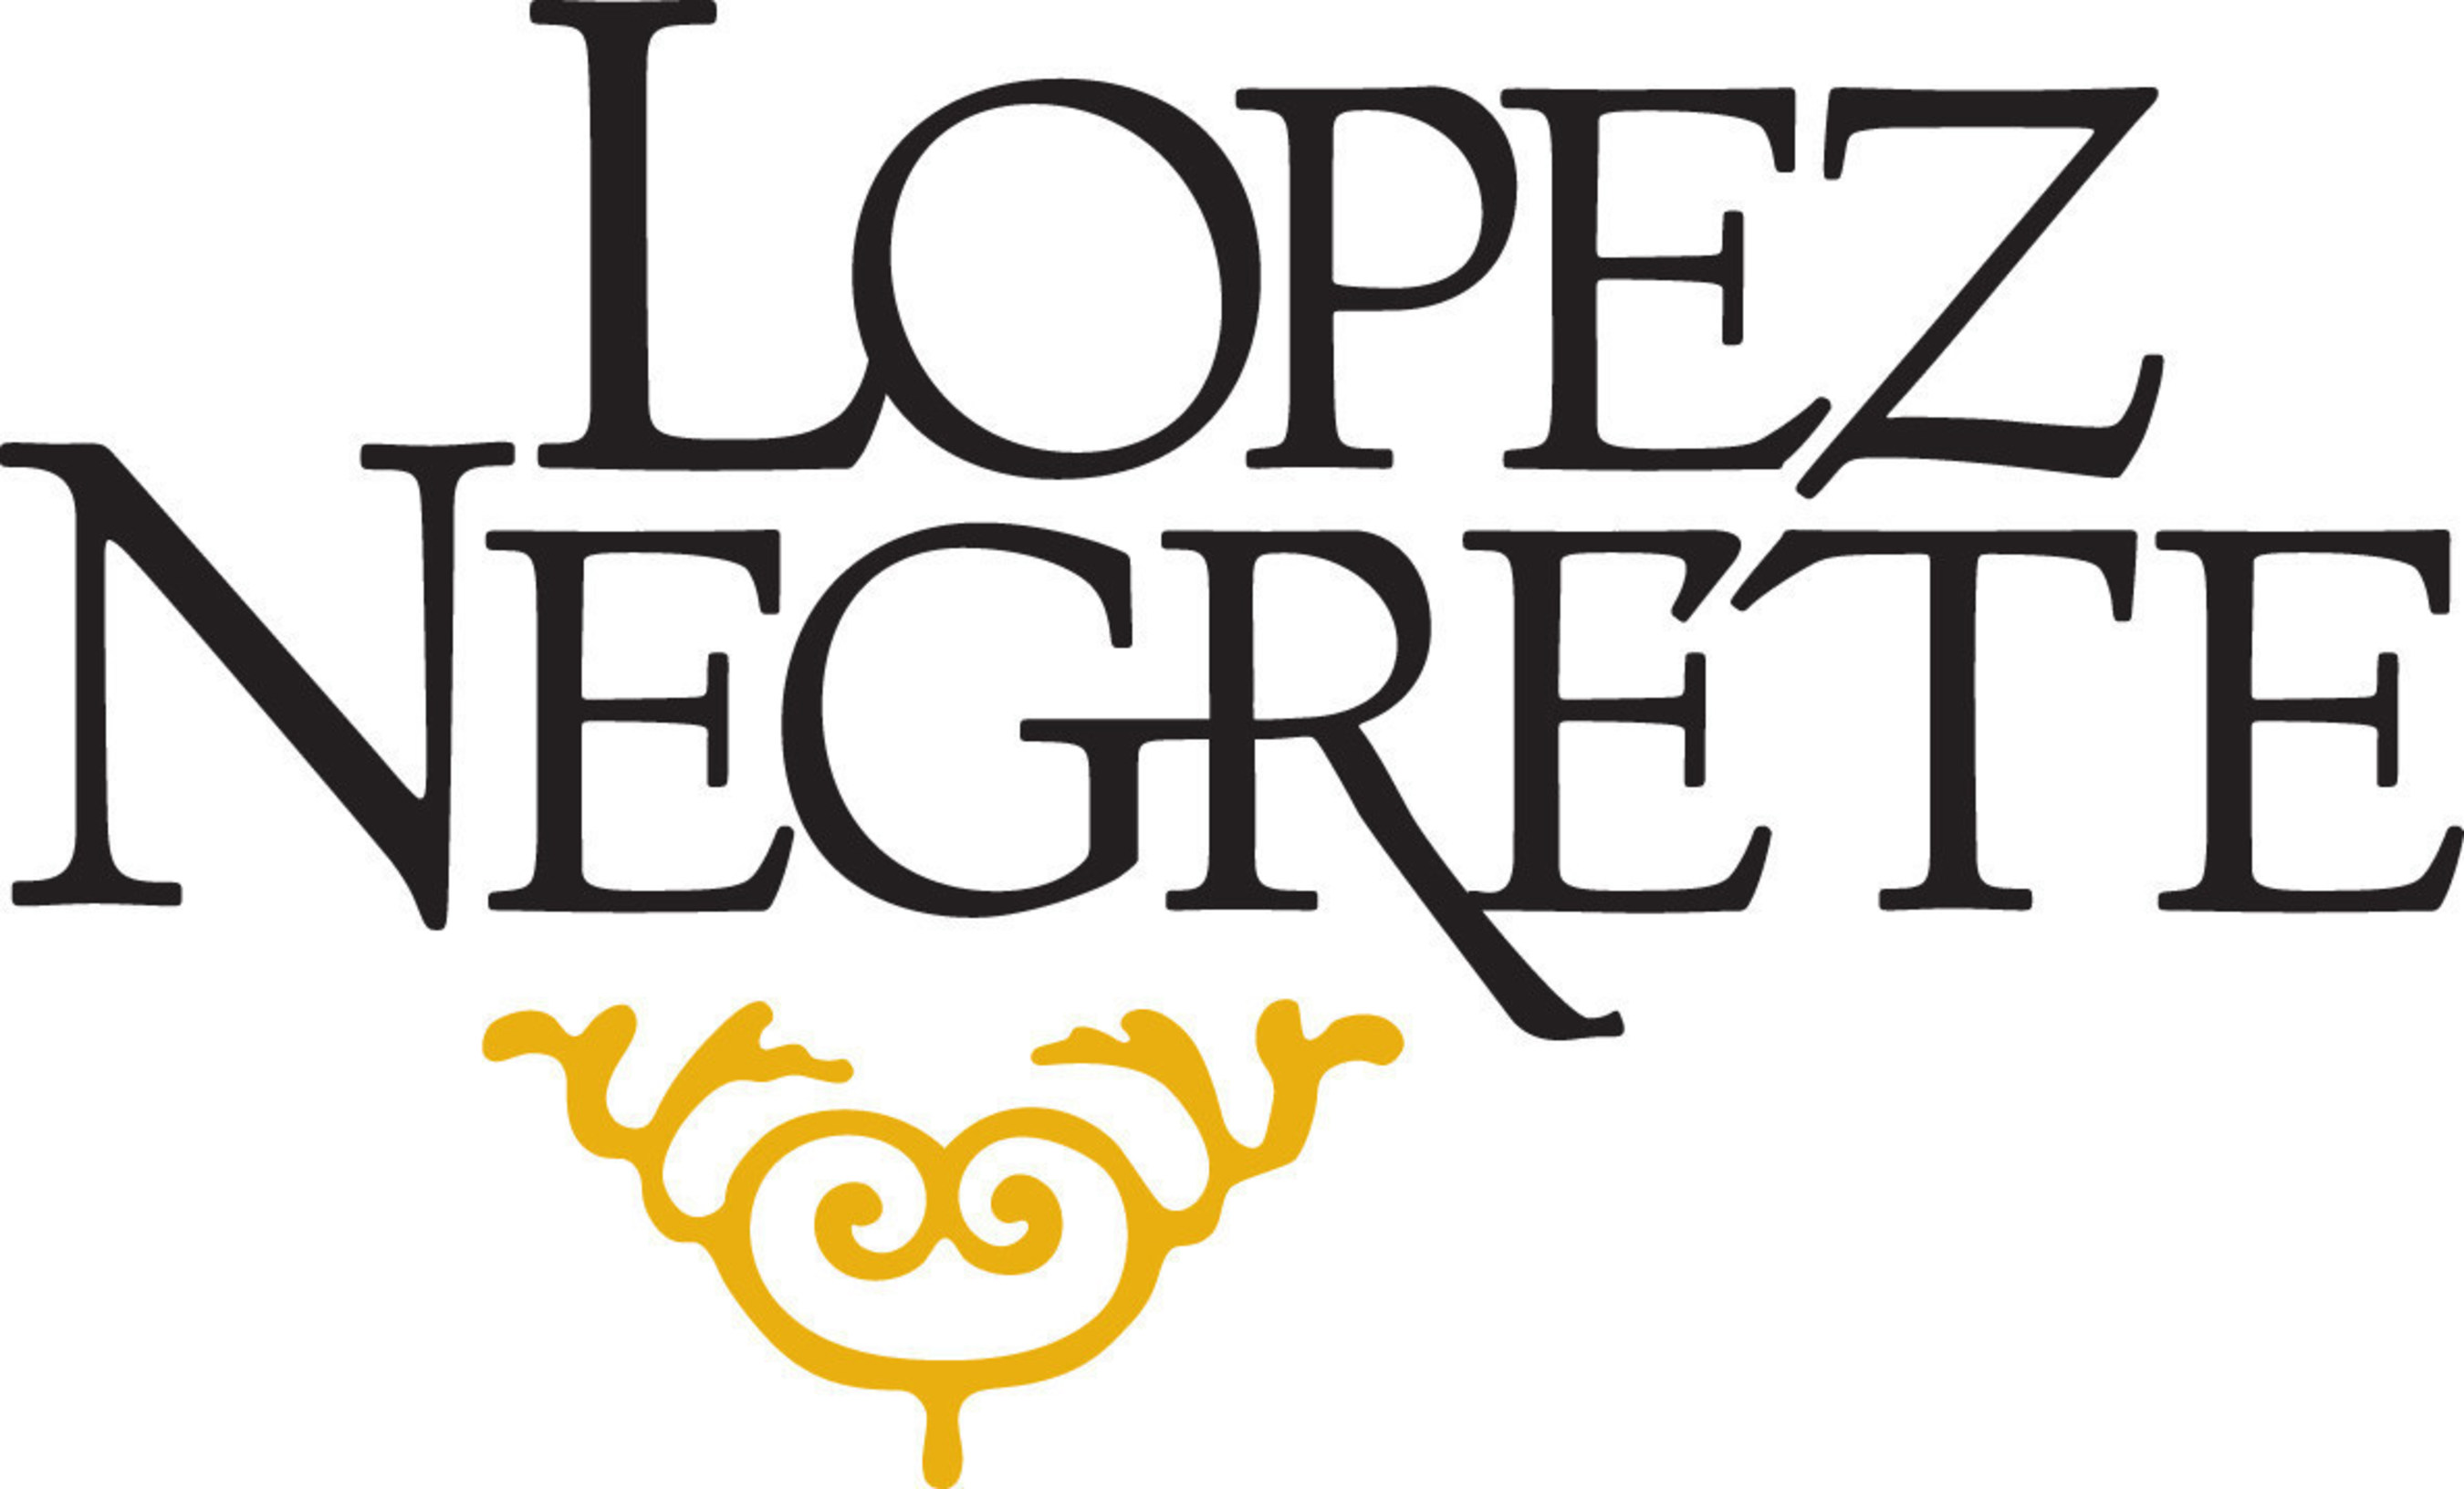 Lopez Negrete Communications, Houston, TX